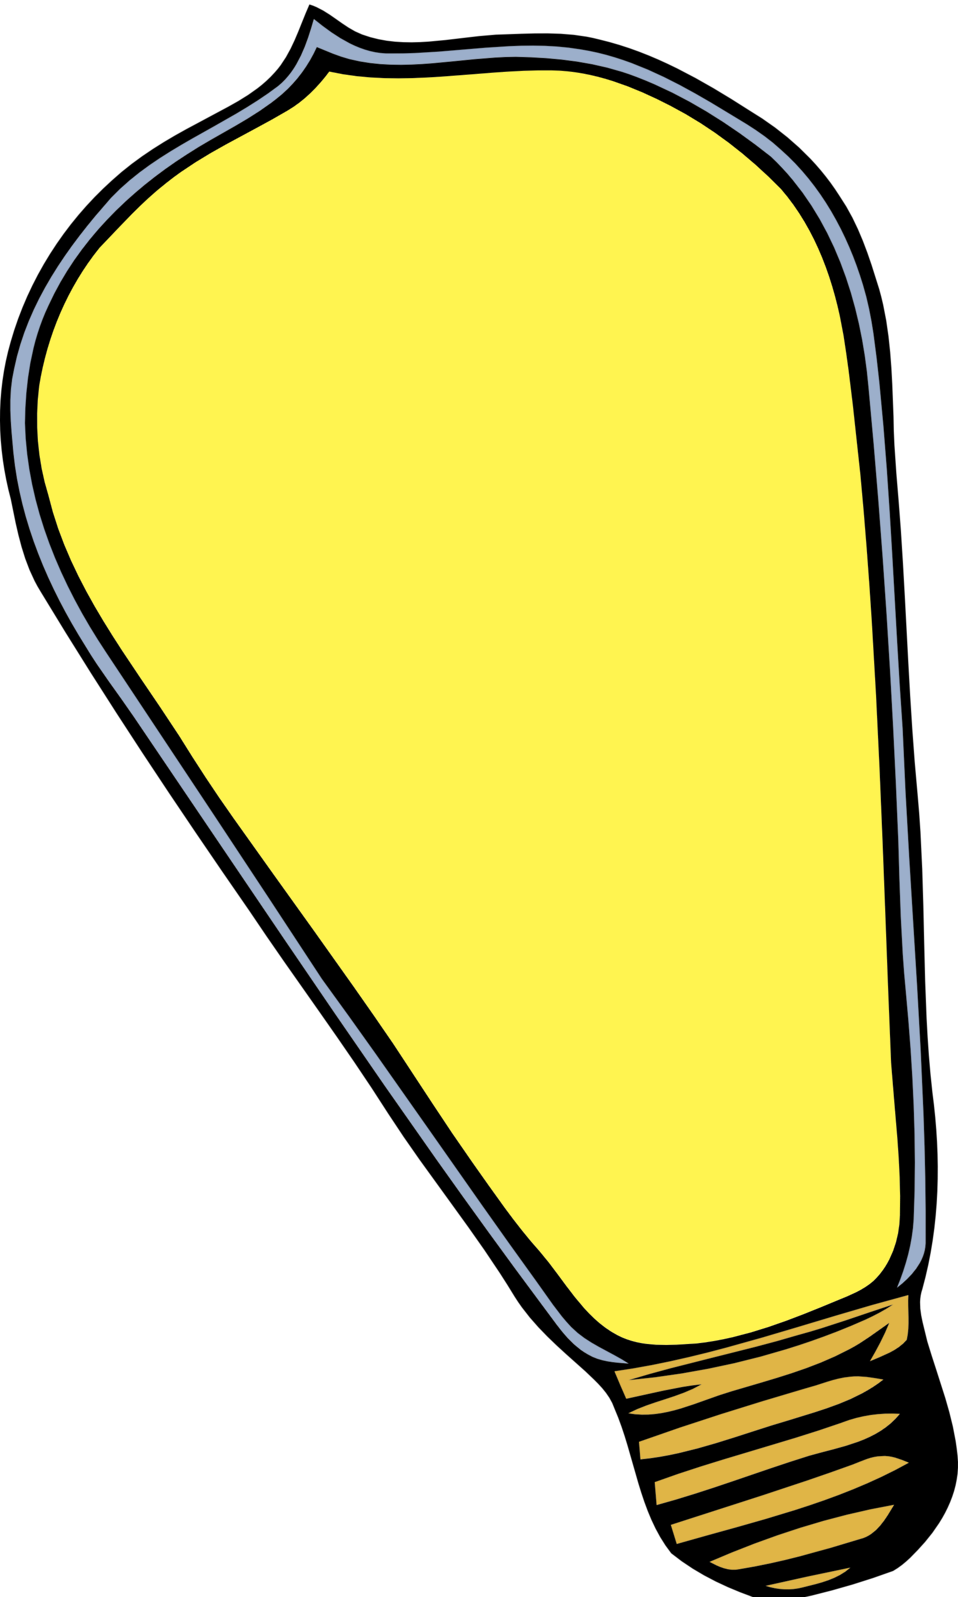 Light bulb clip art public domain. Image lightbulb id